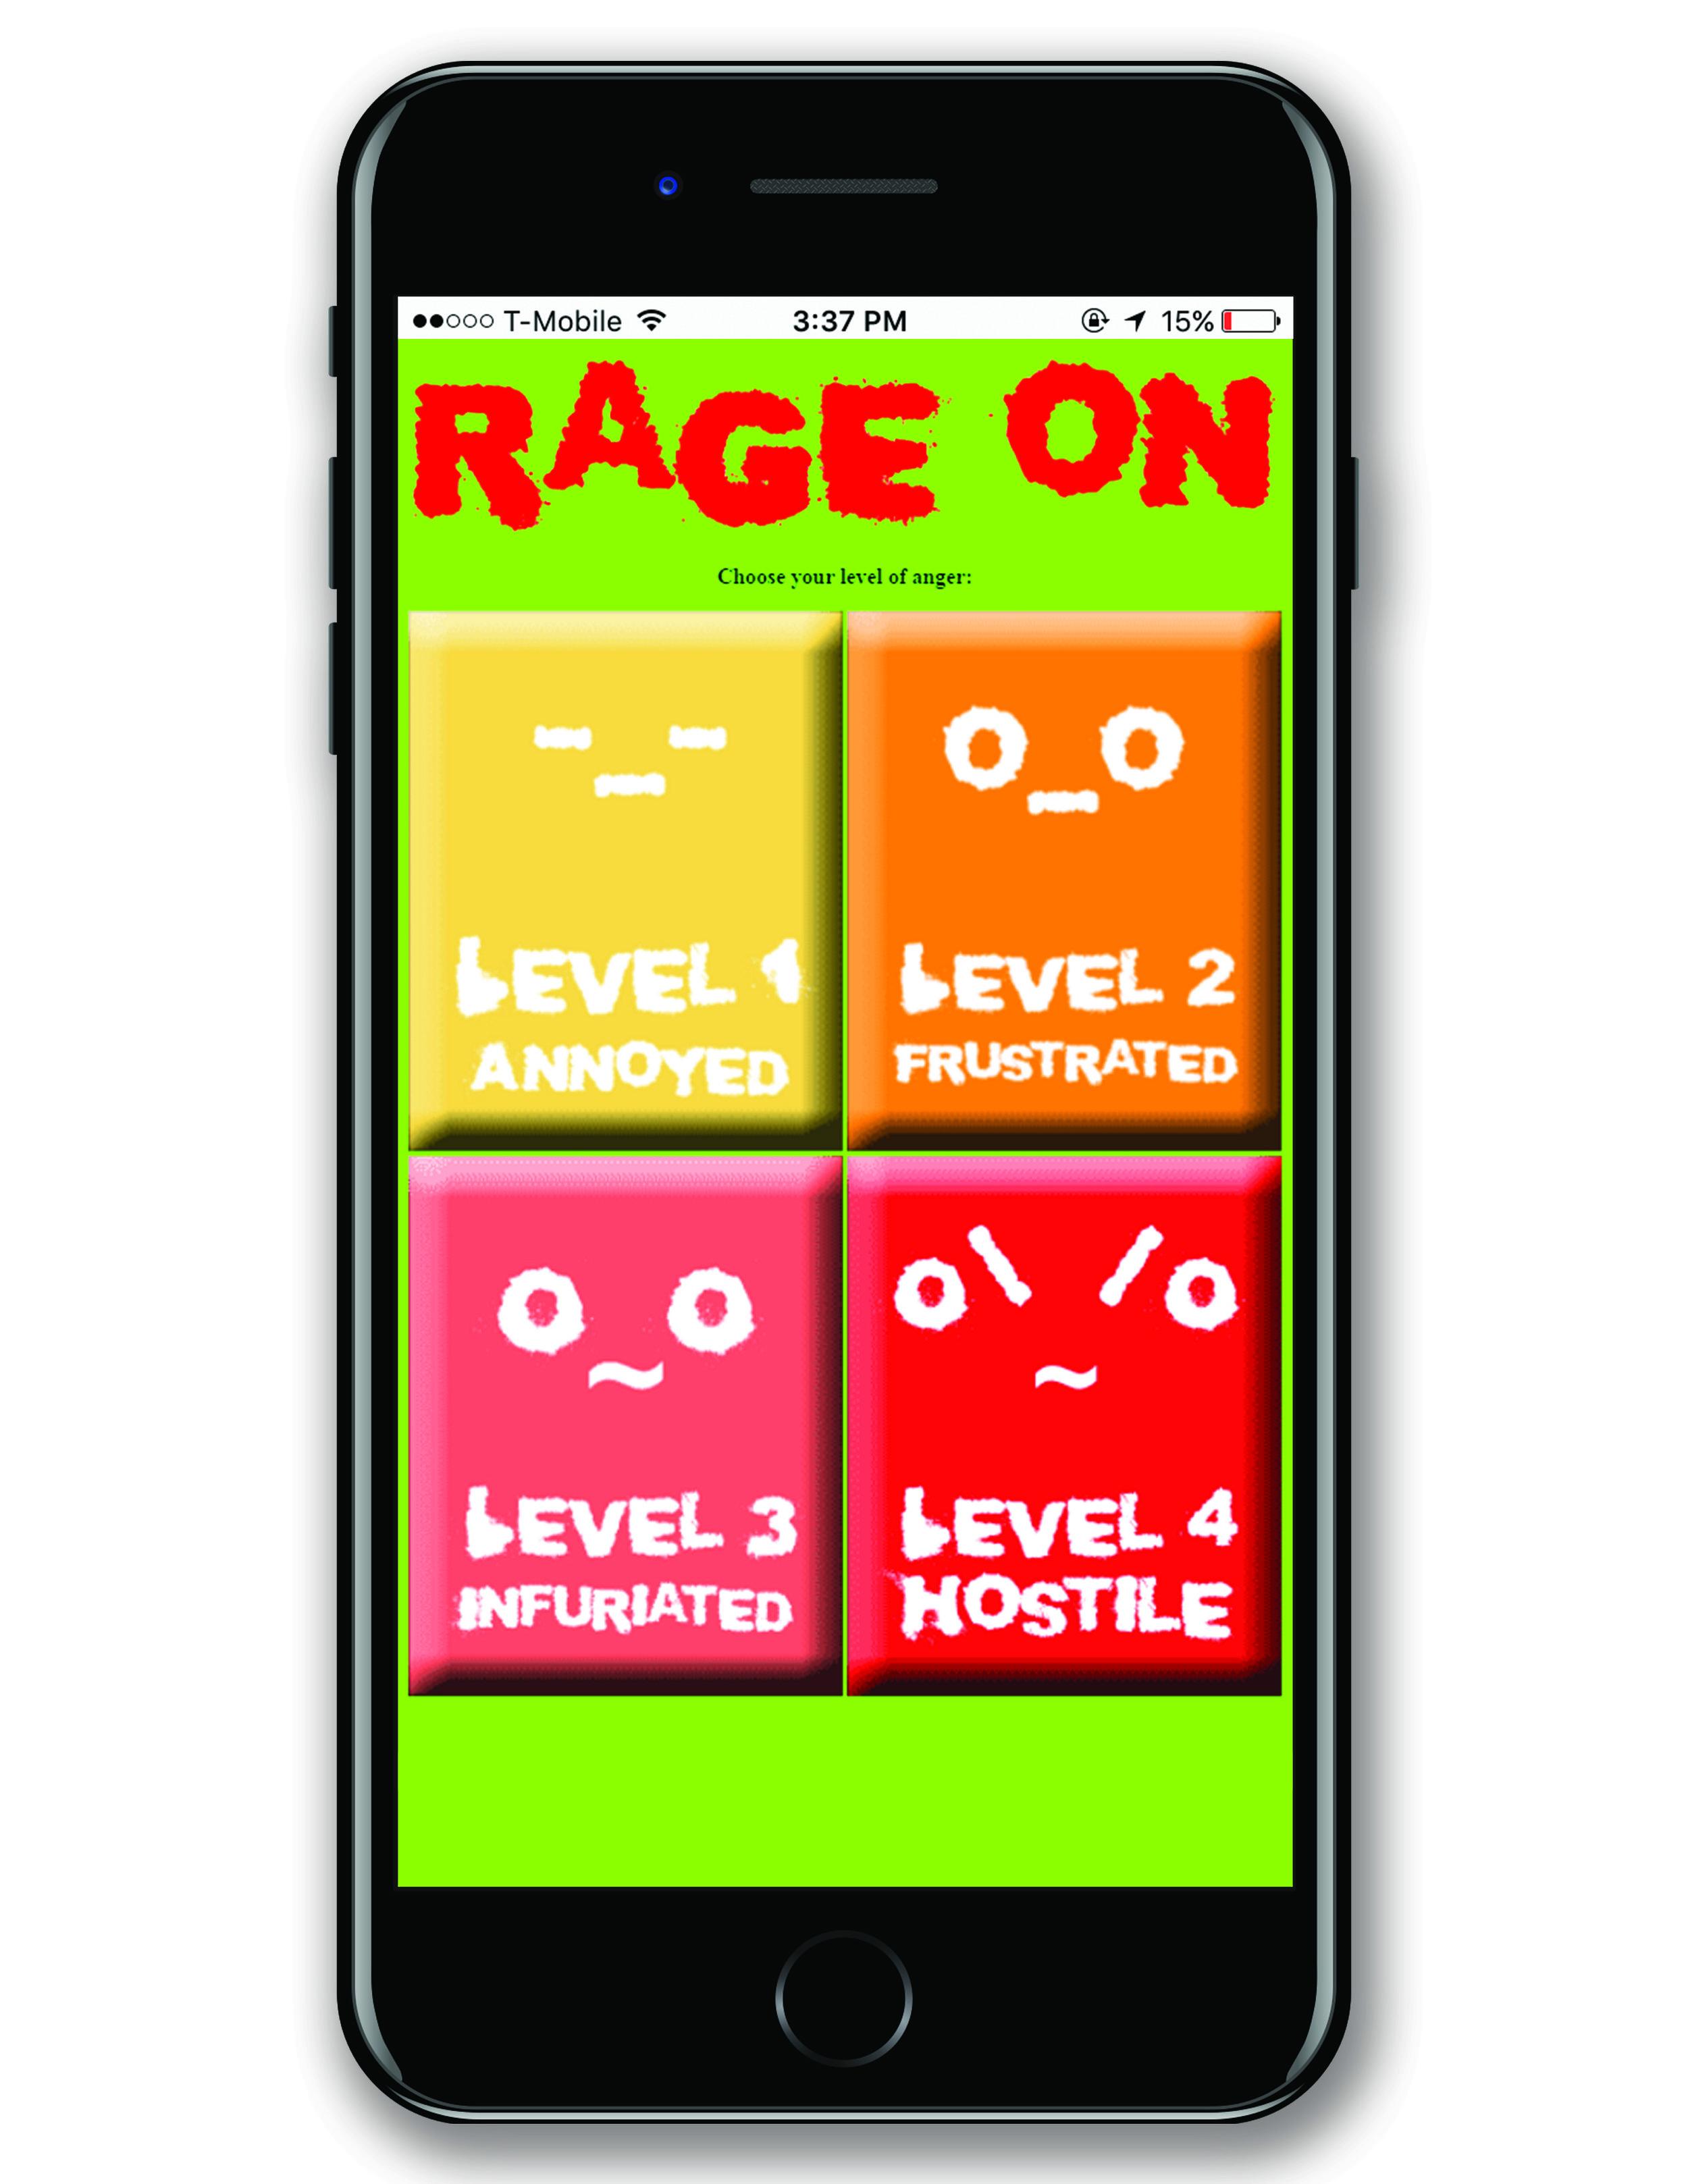 rage on anger level